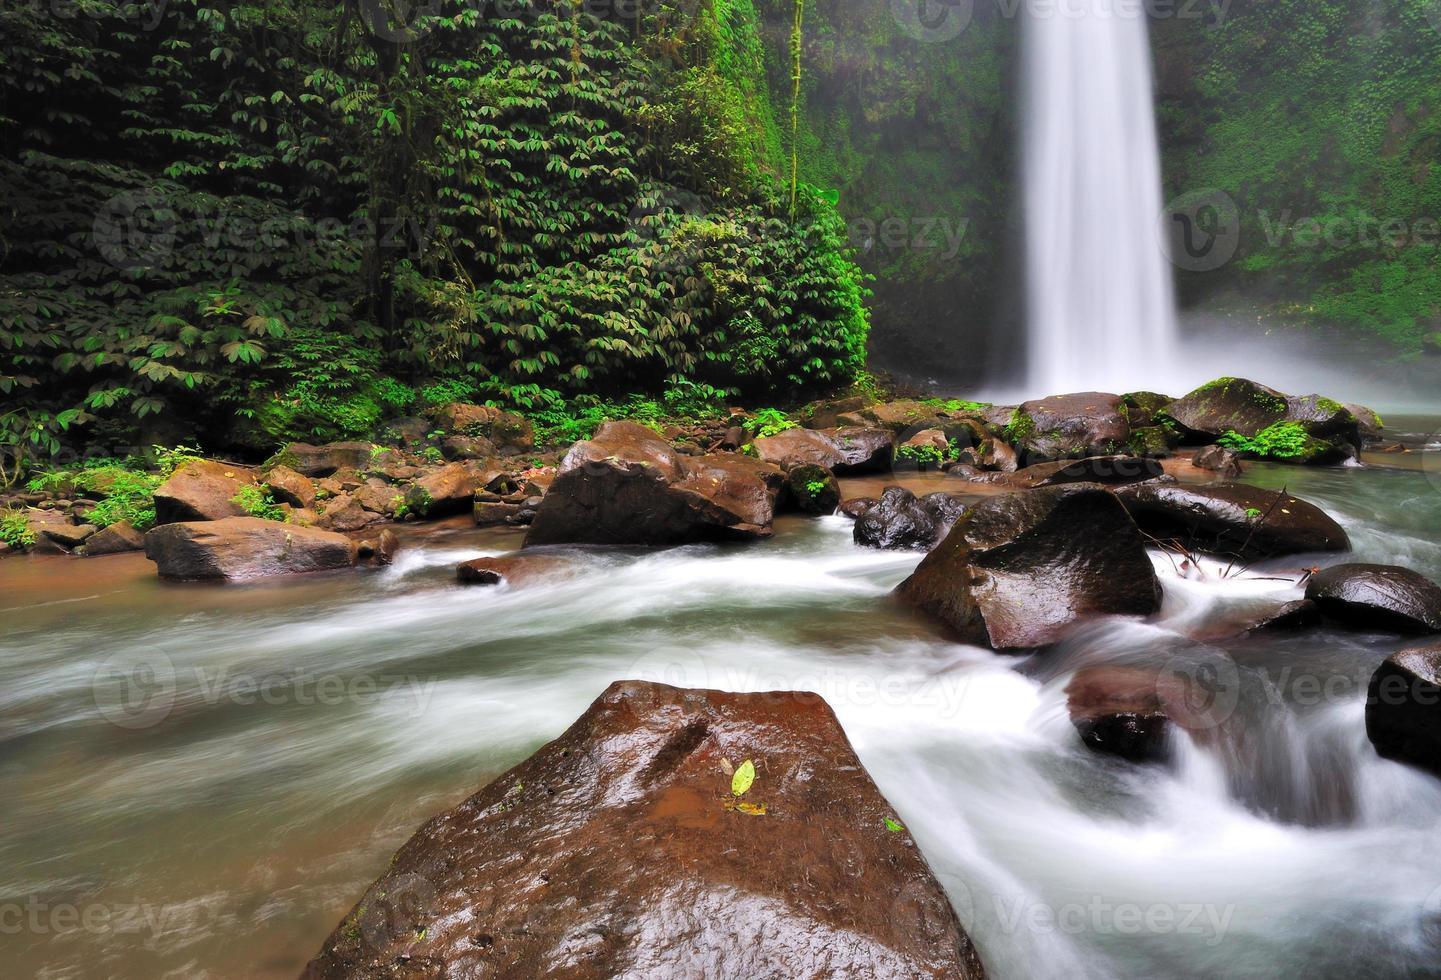 vattenfall i baliens djungel foto